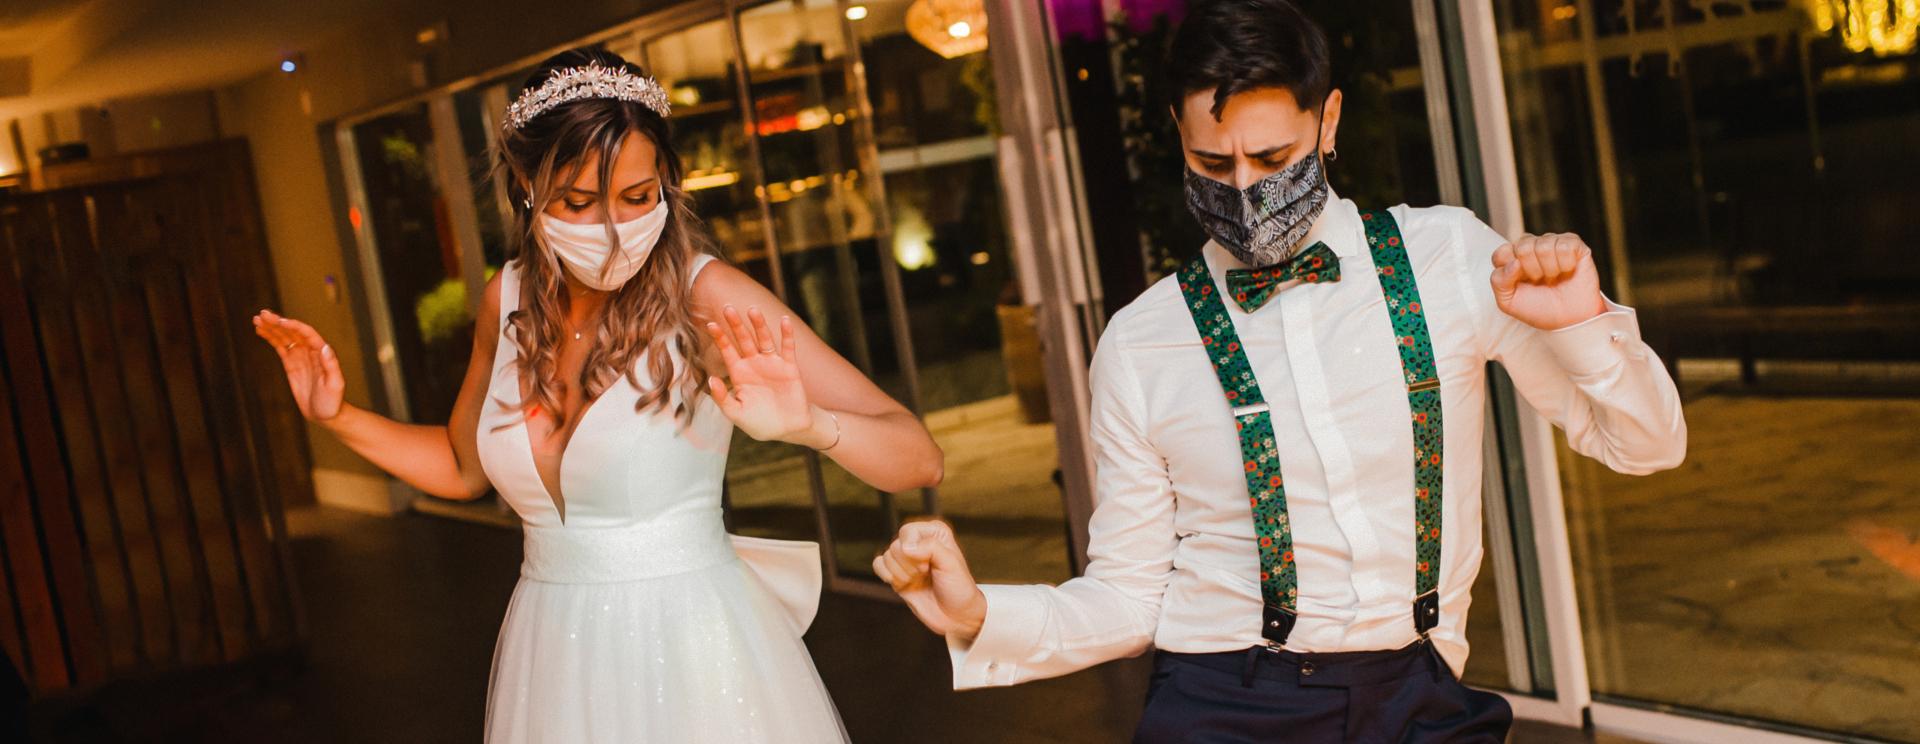 Hochzeit verschieben wegen Corona